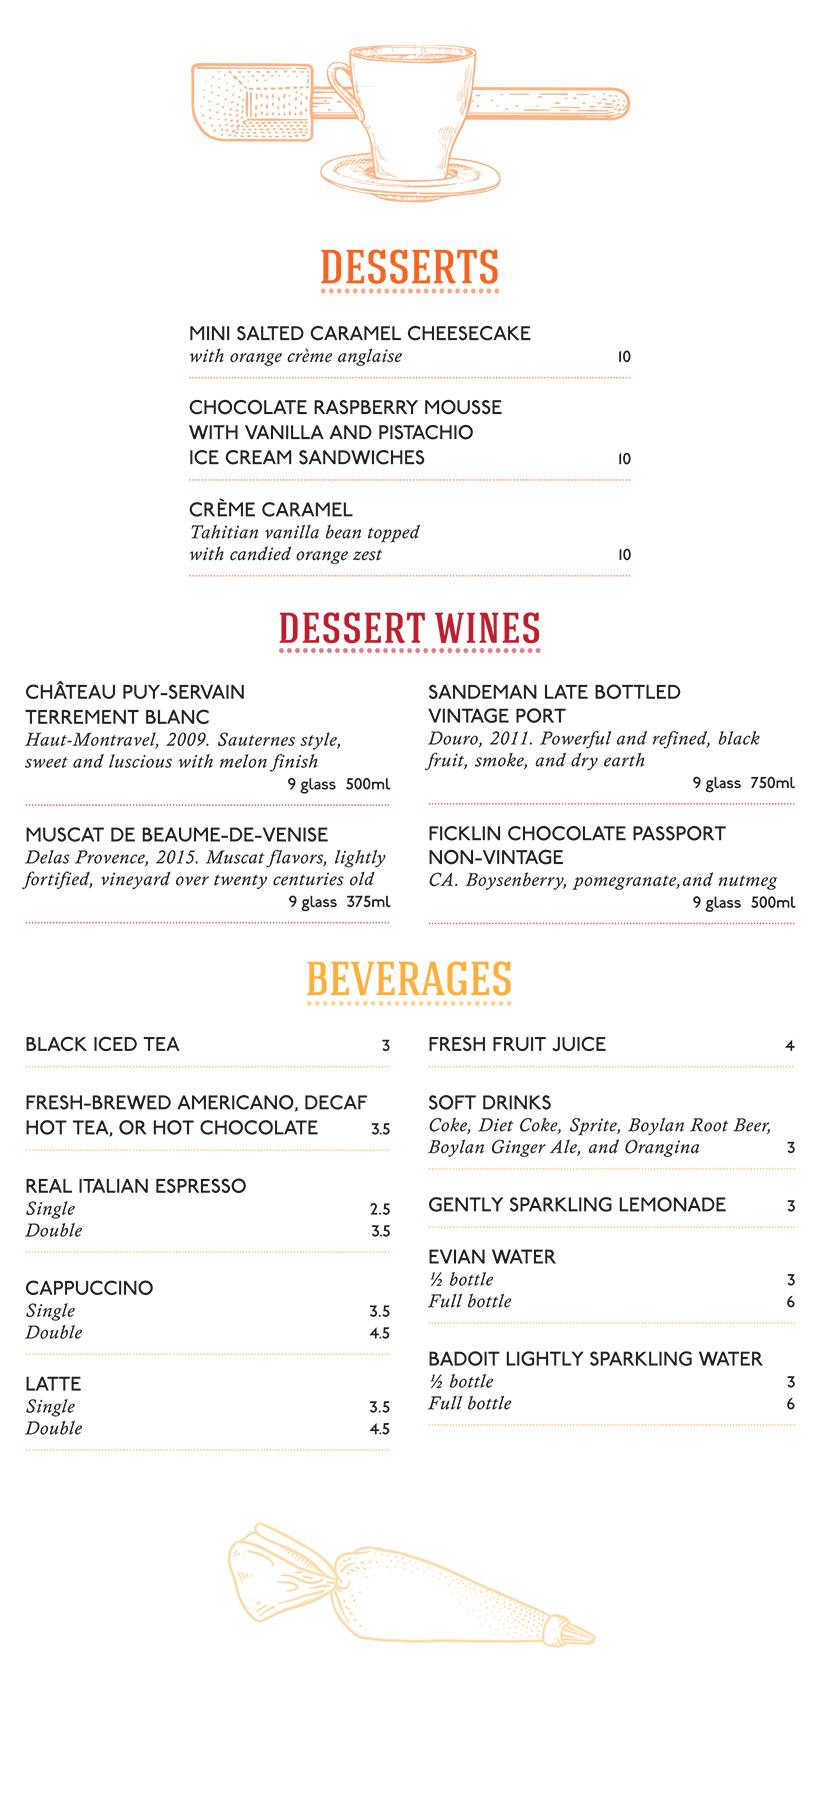 desserts-060618.jpg